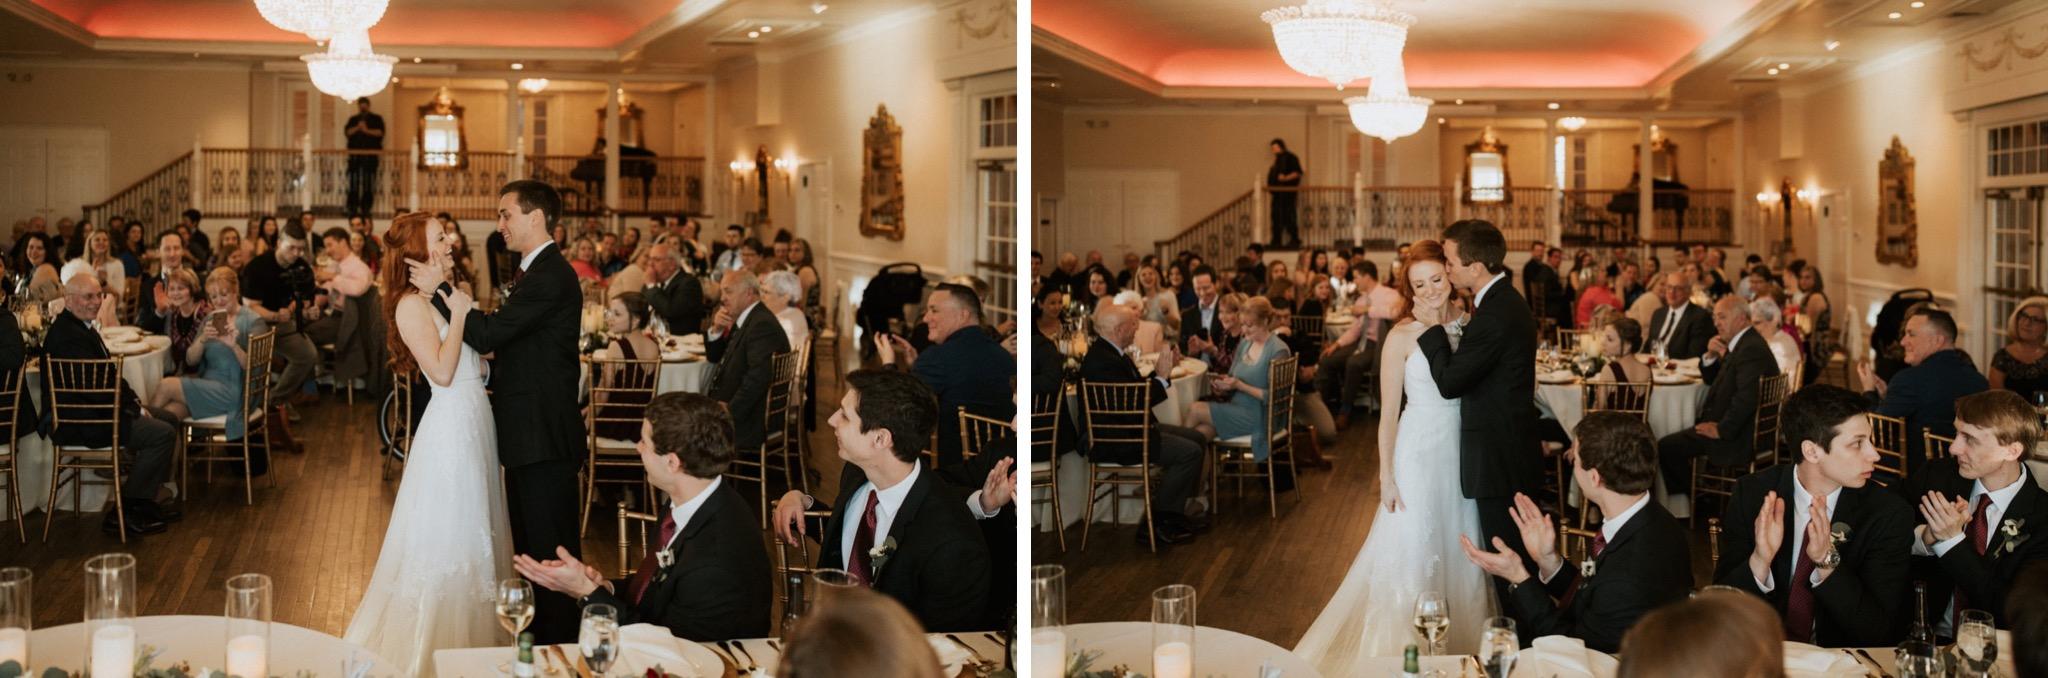 77_West Manor Estate Weddings - Pat Cori Photography-164_West Manor Estate Weddings - Pat Cori Photography-165_VirginiaWeddingPhotographer_WestManorEstate_Firstdance_Wedding.jpg